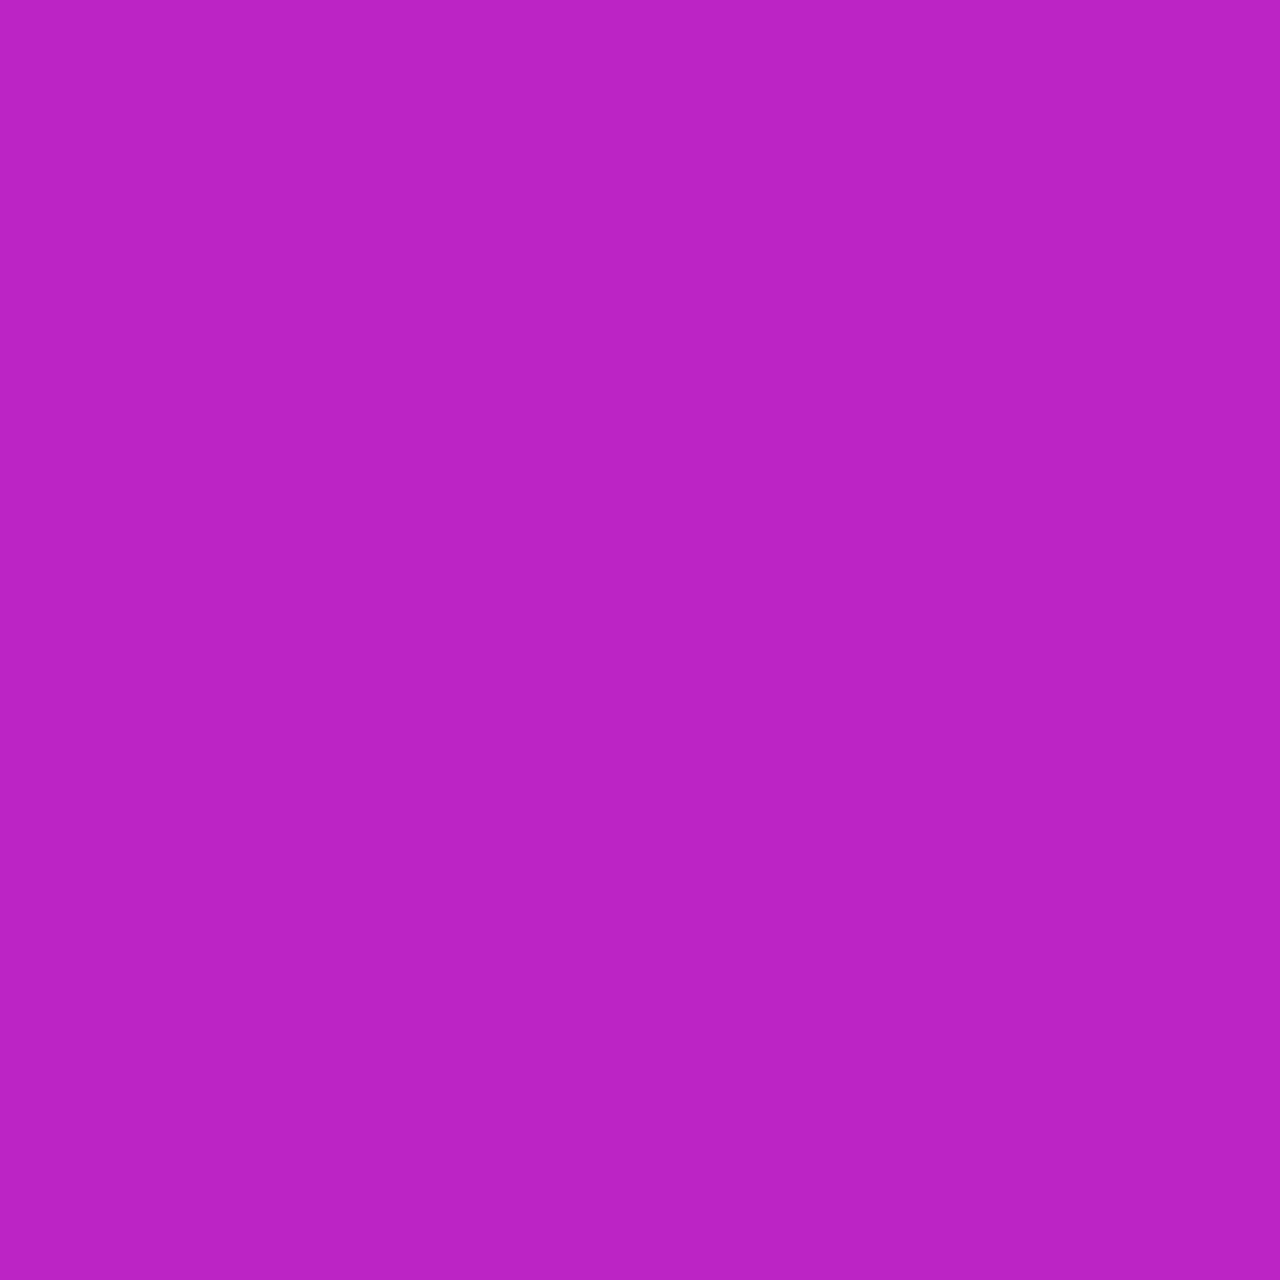 "#4730 Rosco Gels Roscolux CalColor 30 Magenta, 20x24"""